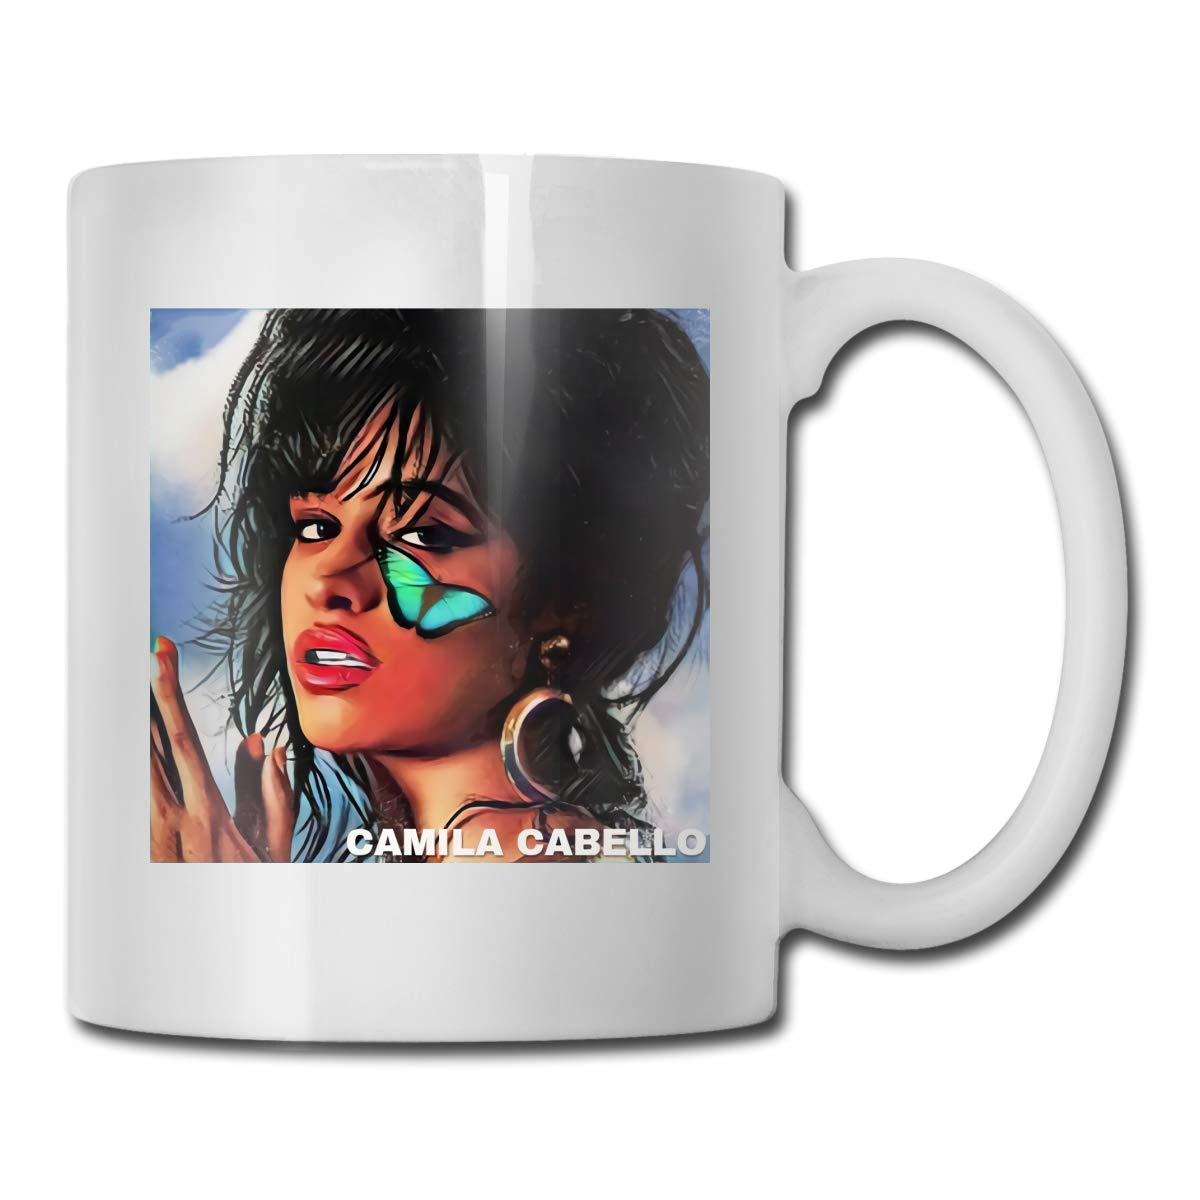 Camilla Cabello Ceramic Tea Coffee Mug Coaster Gift Set